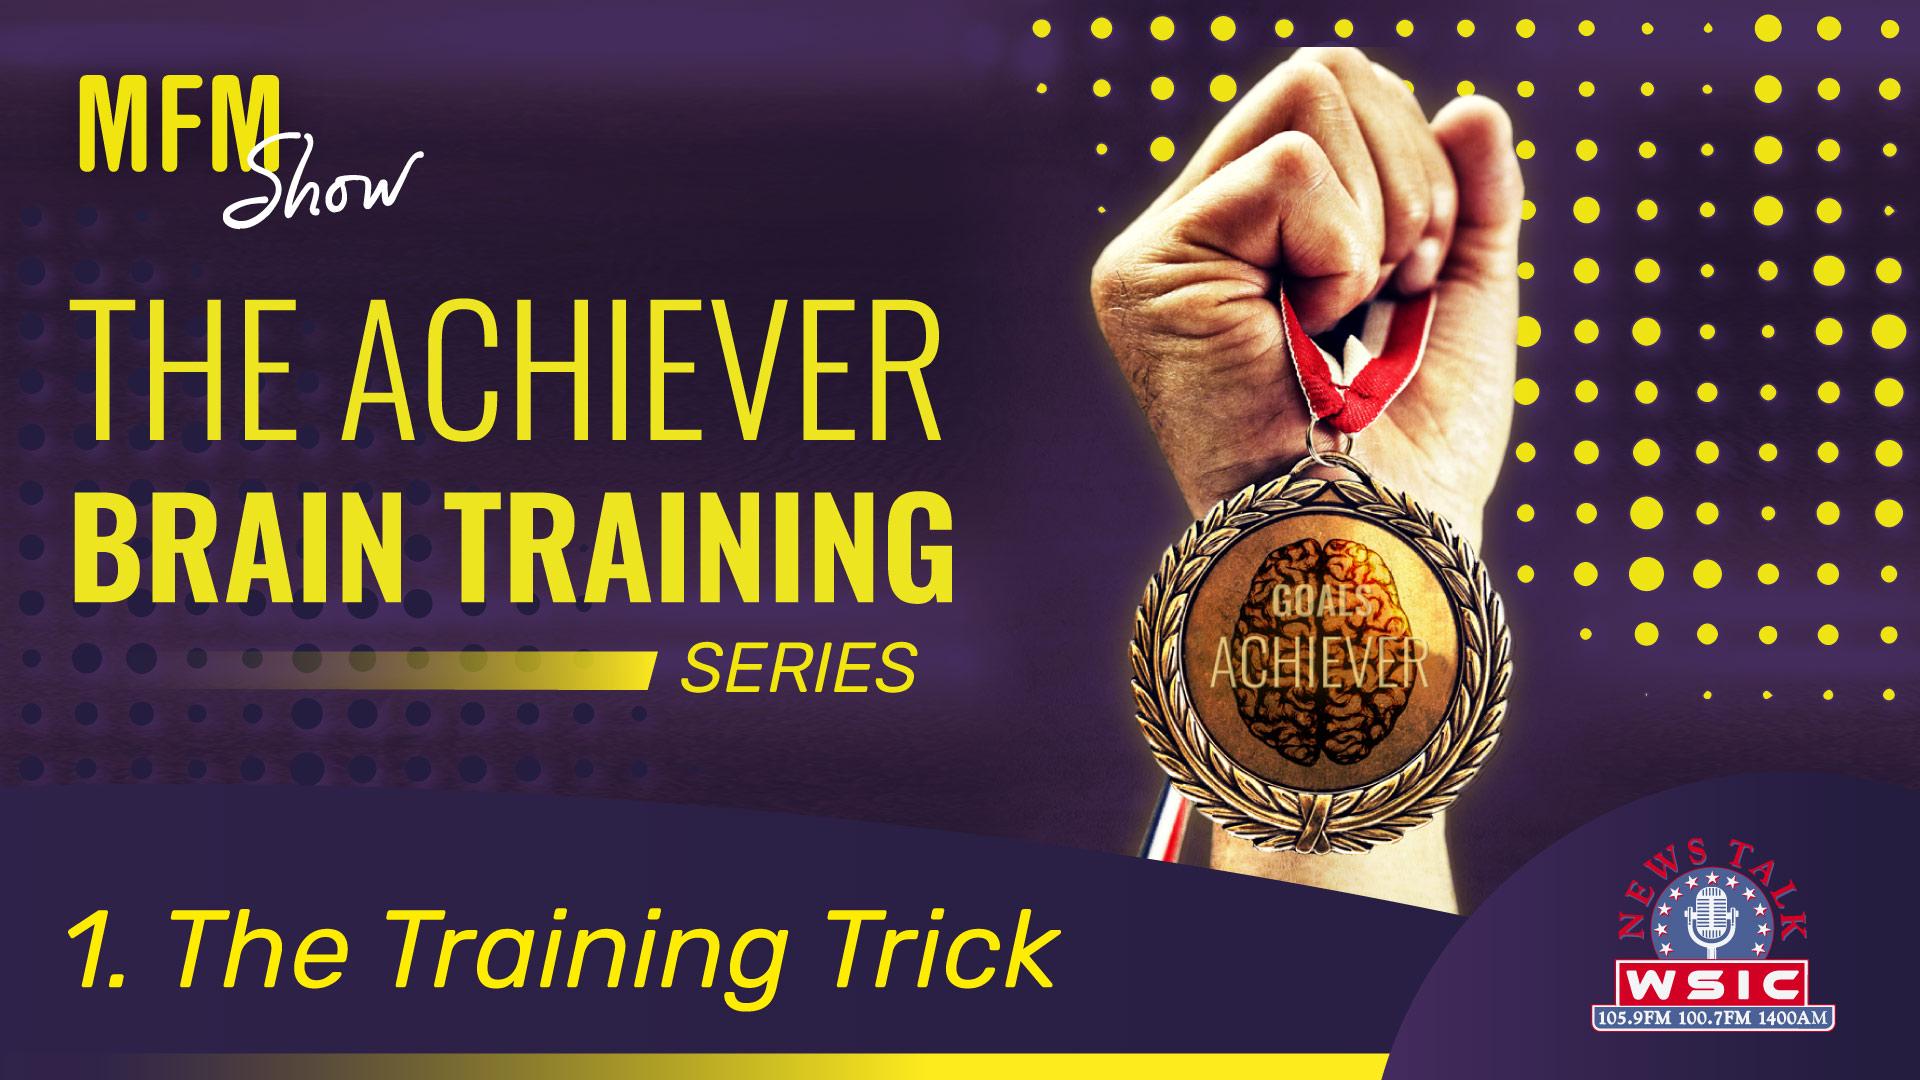 The achiever brain training 1